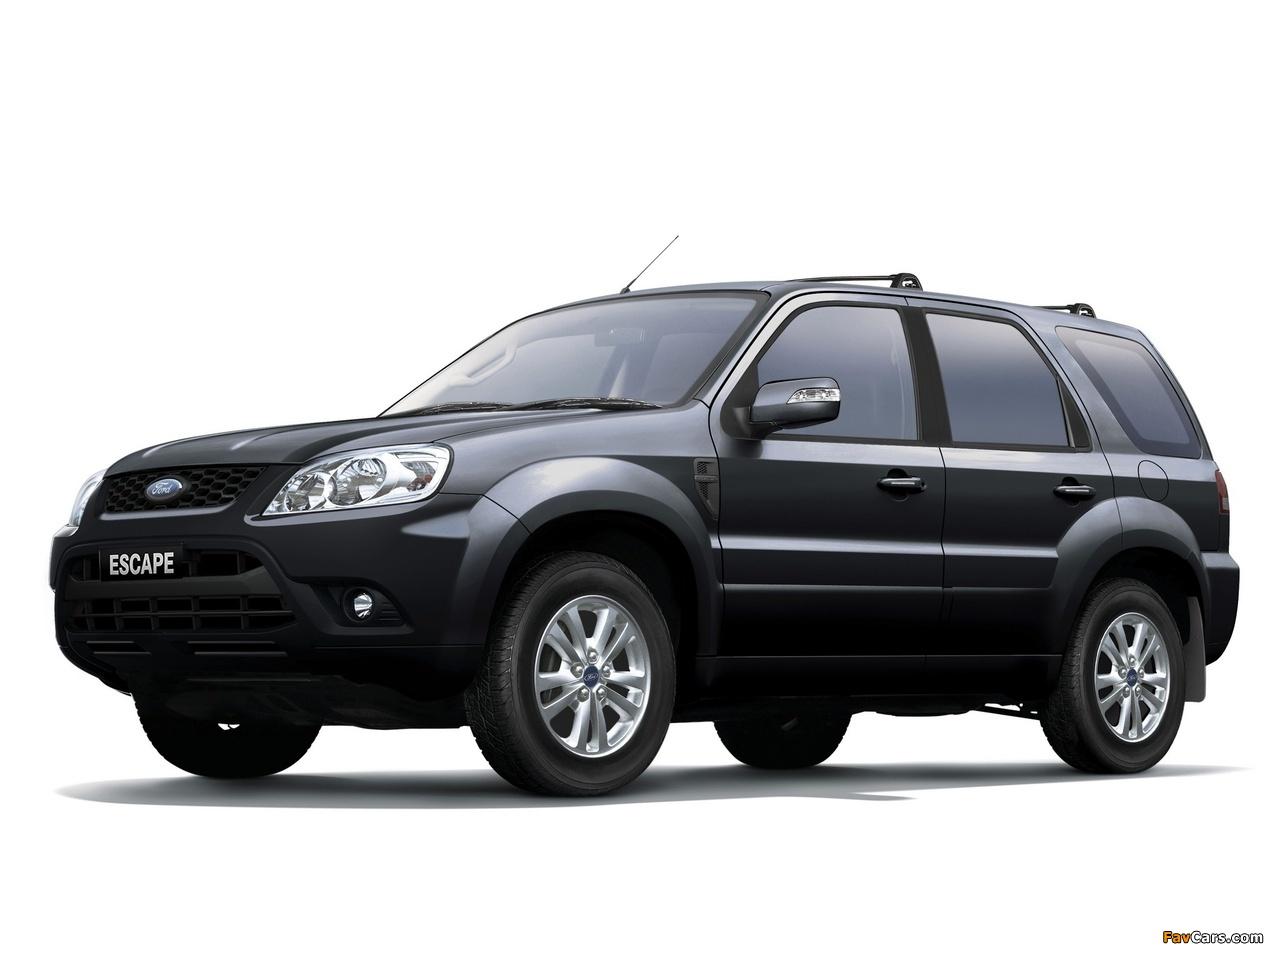 Ford Escape TW-spec 2010 pictures (1280x960)